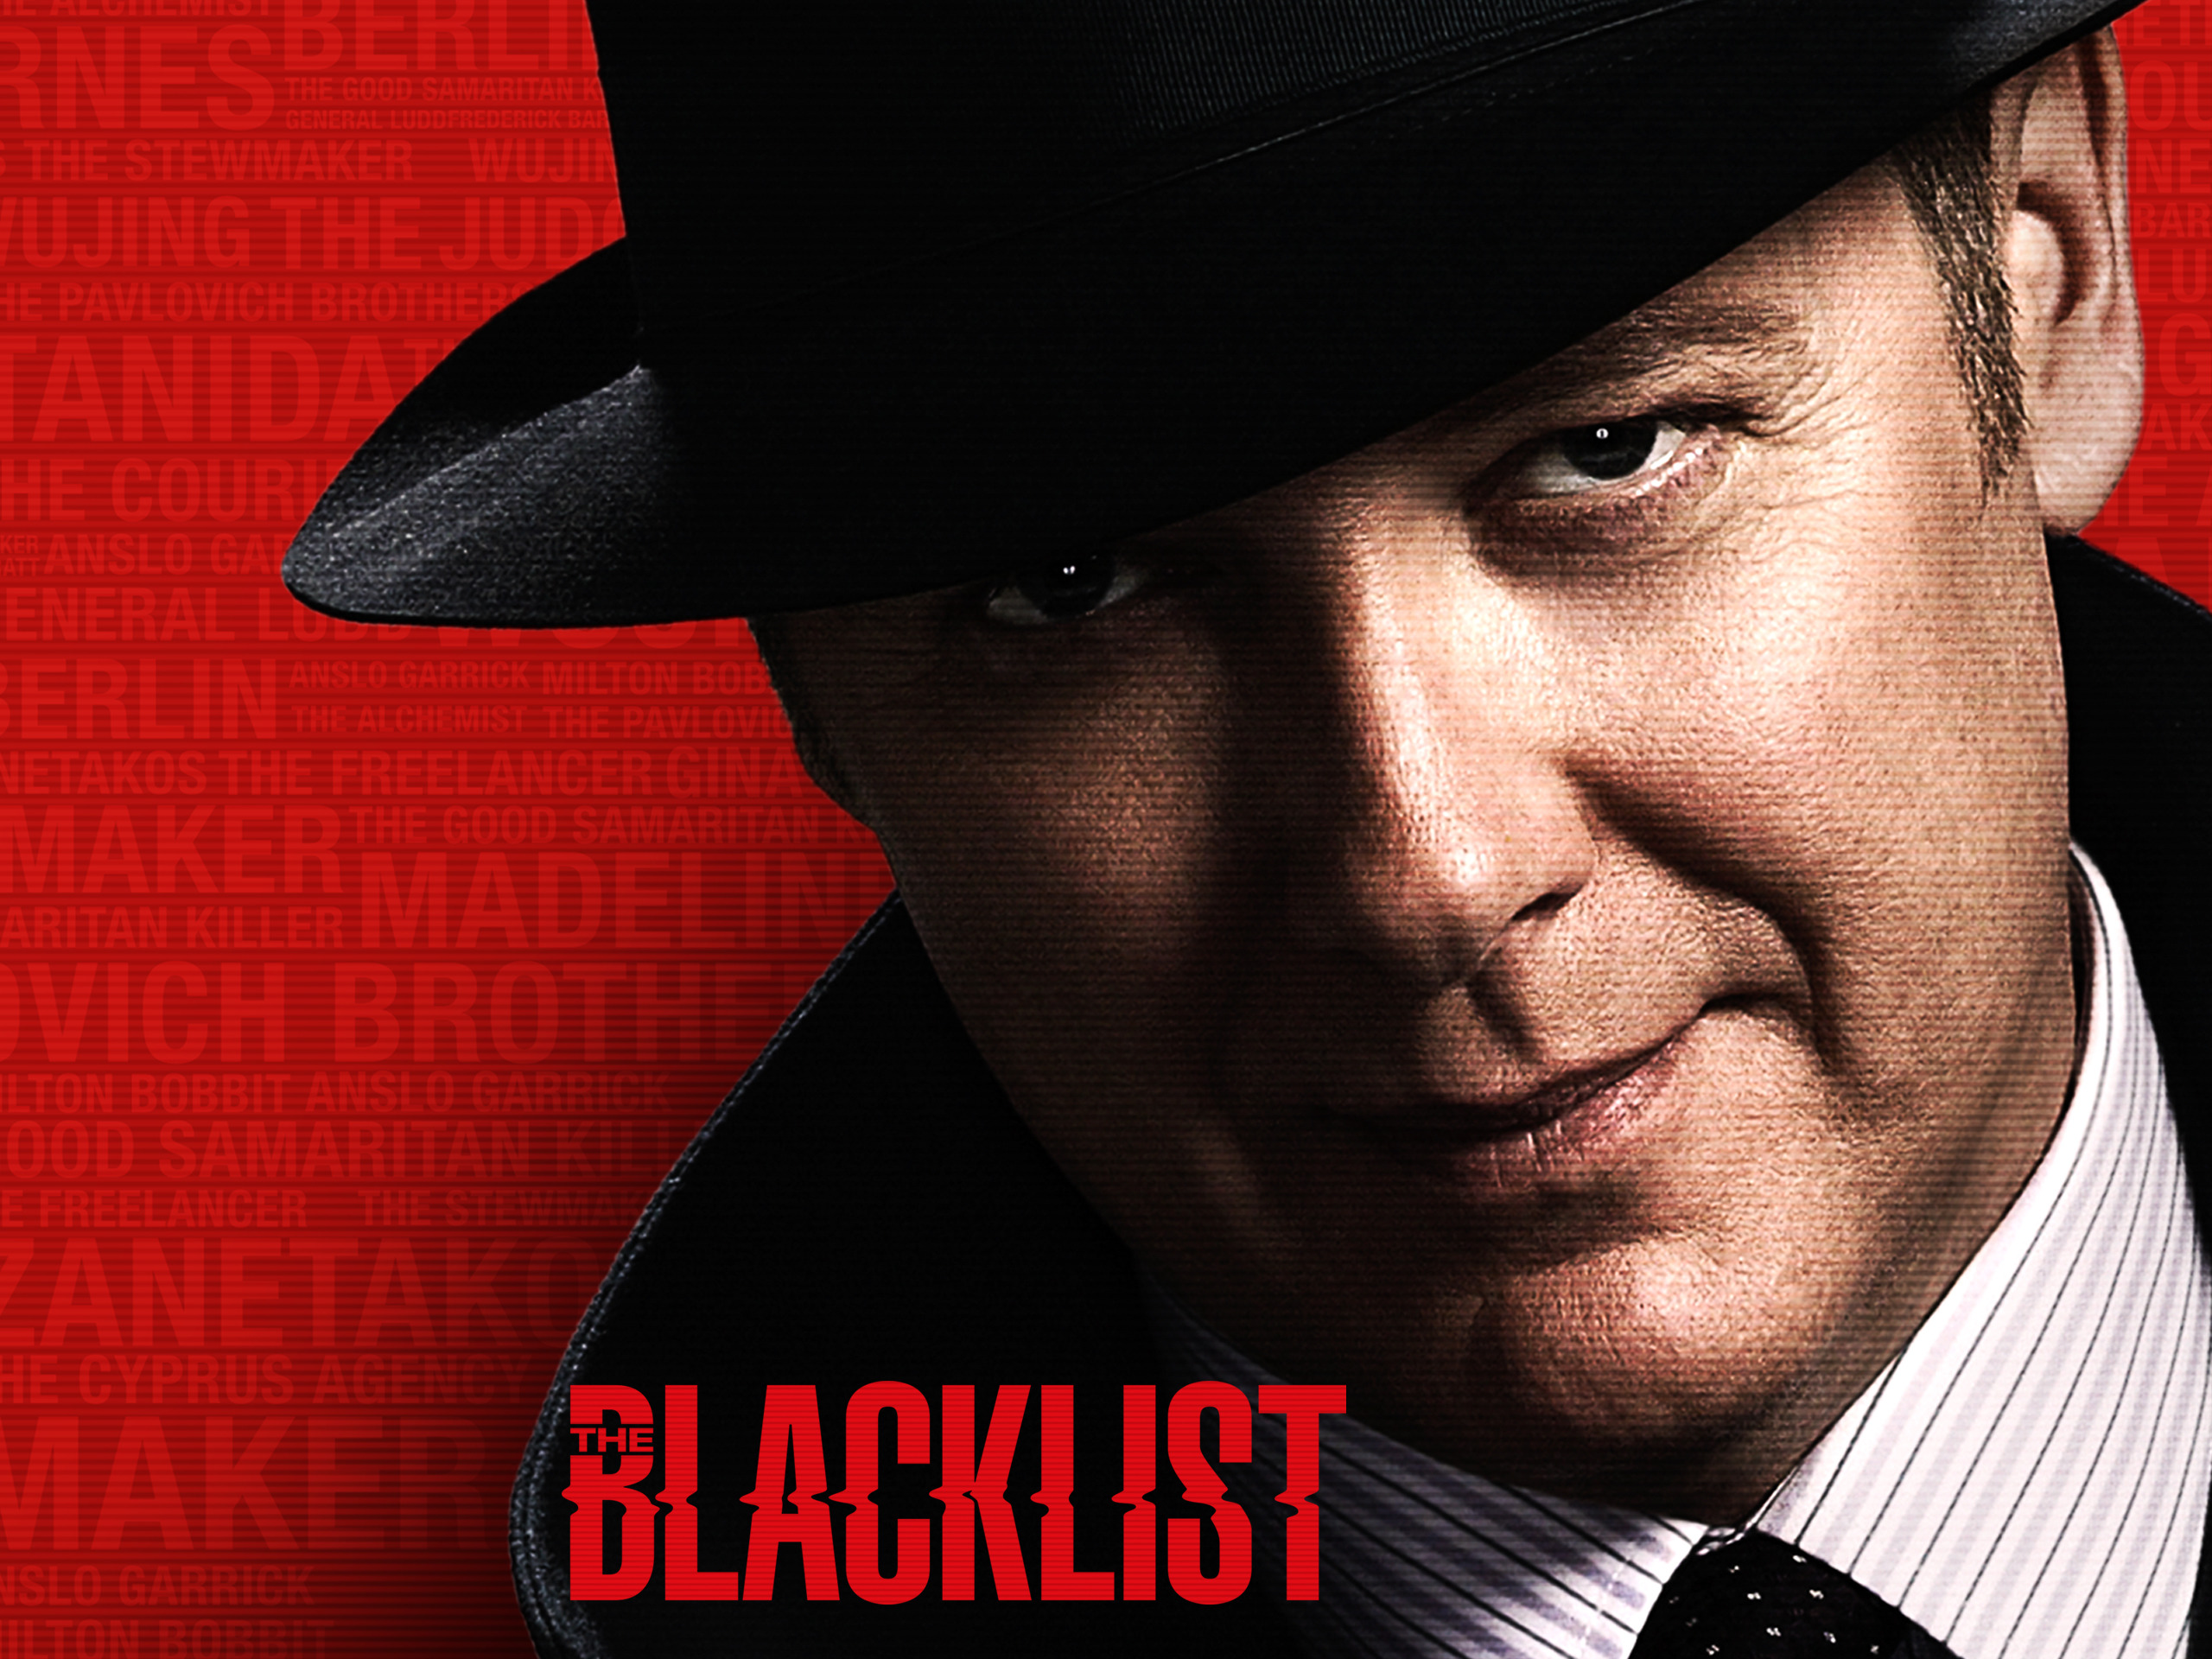 The Blacklist Amazon Prime